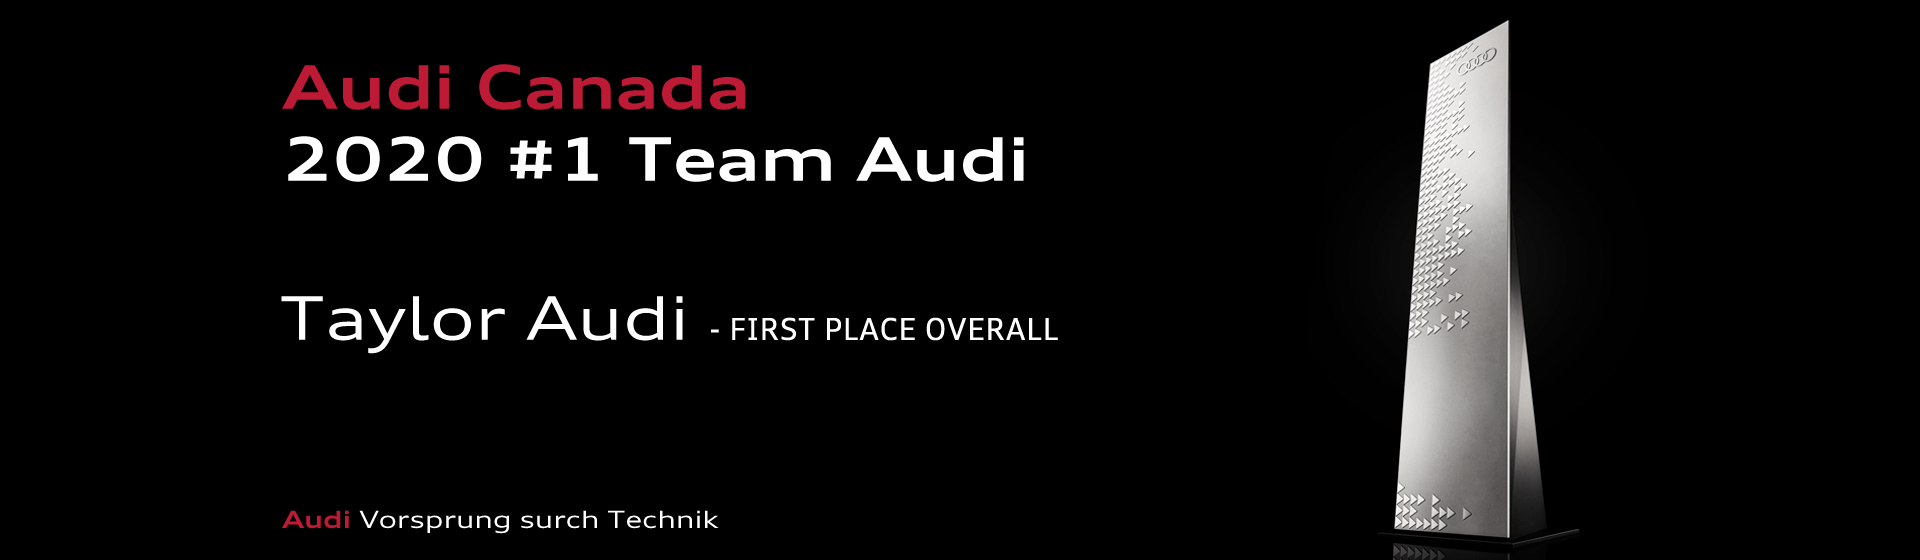 1 Team Audi